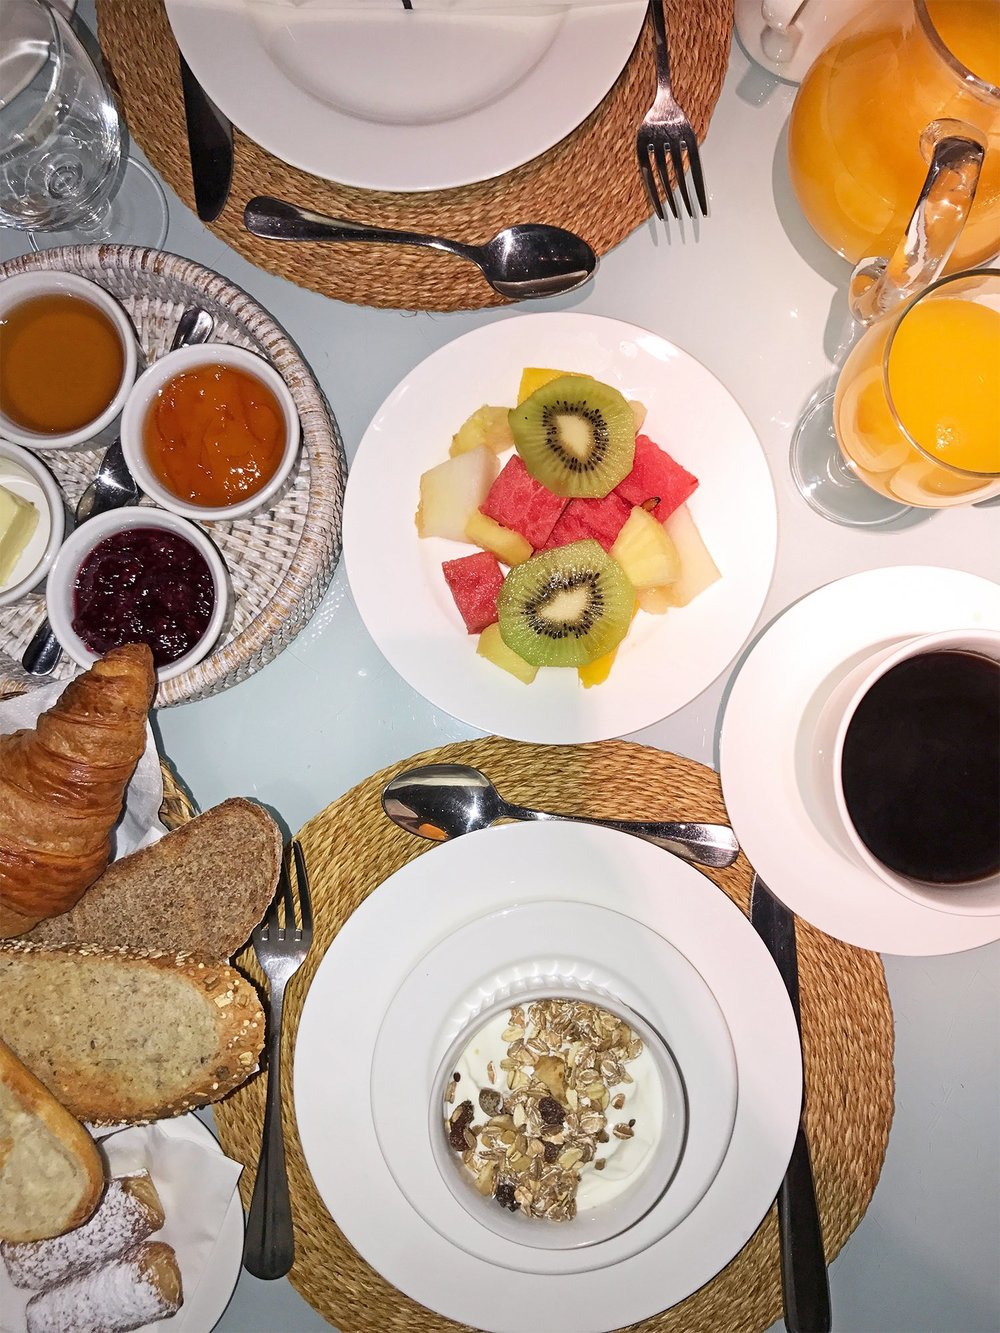 Corral del Rey hotel Seville Spain breakfast.jpg